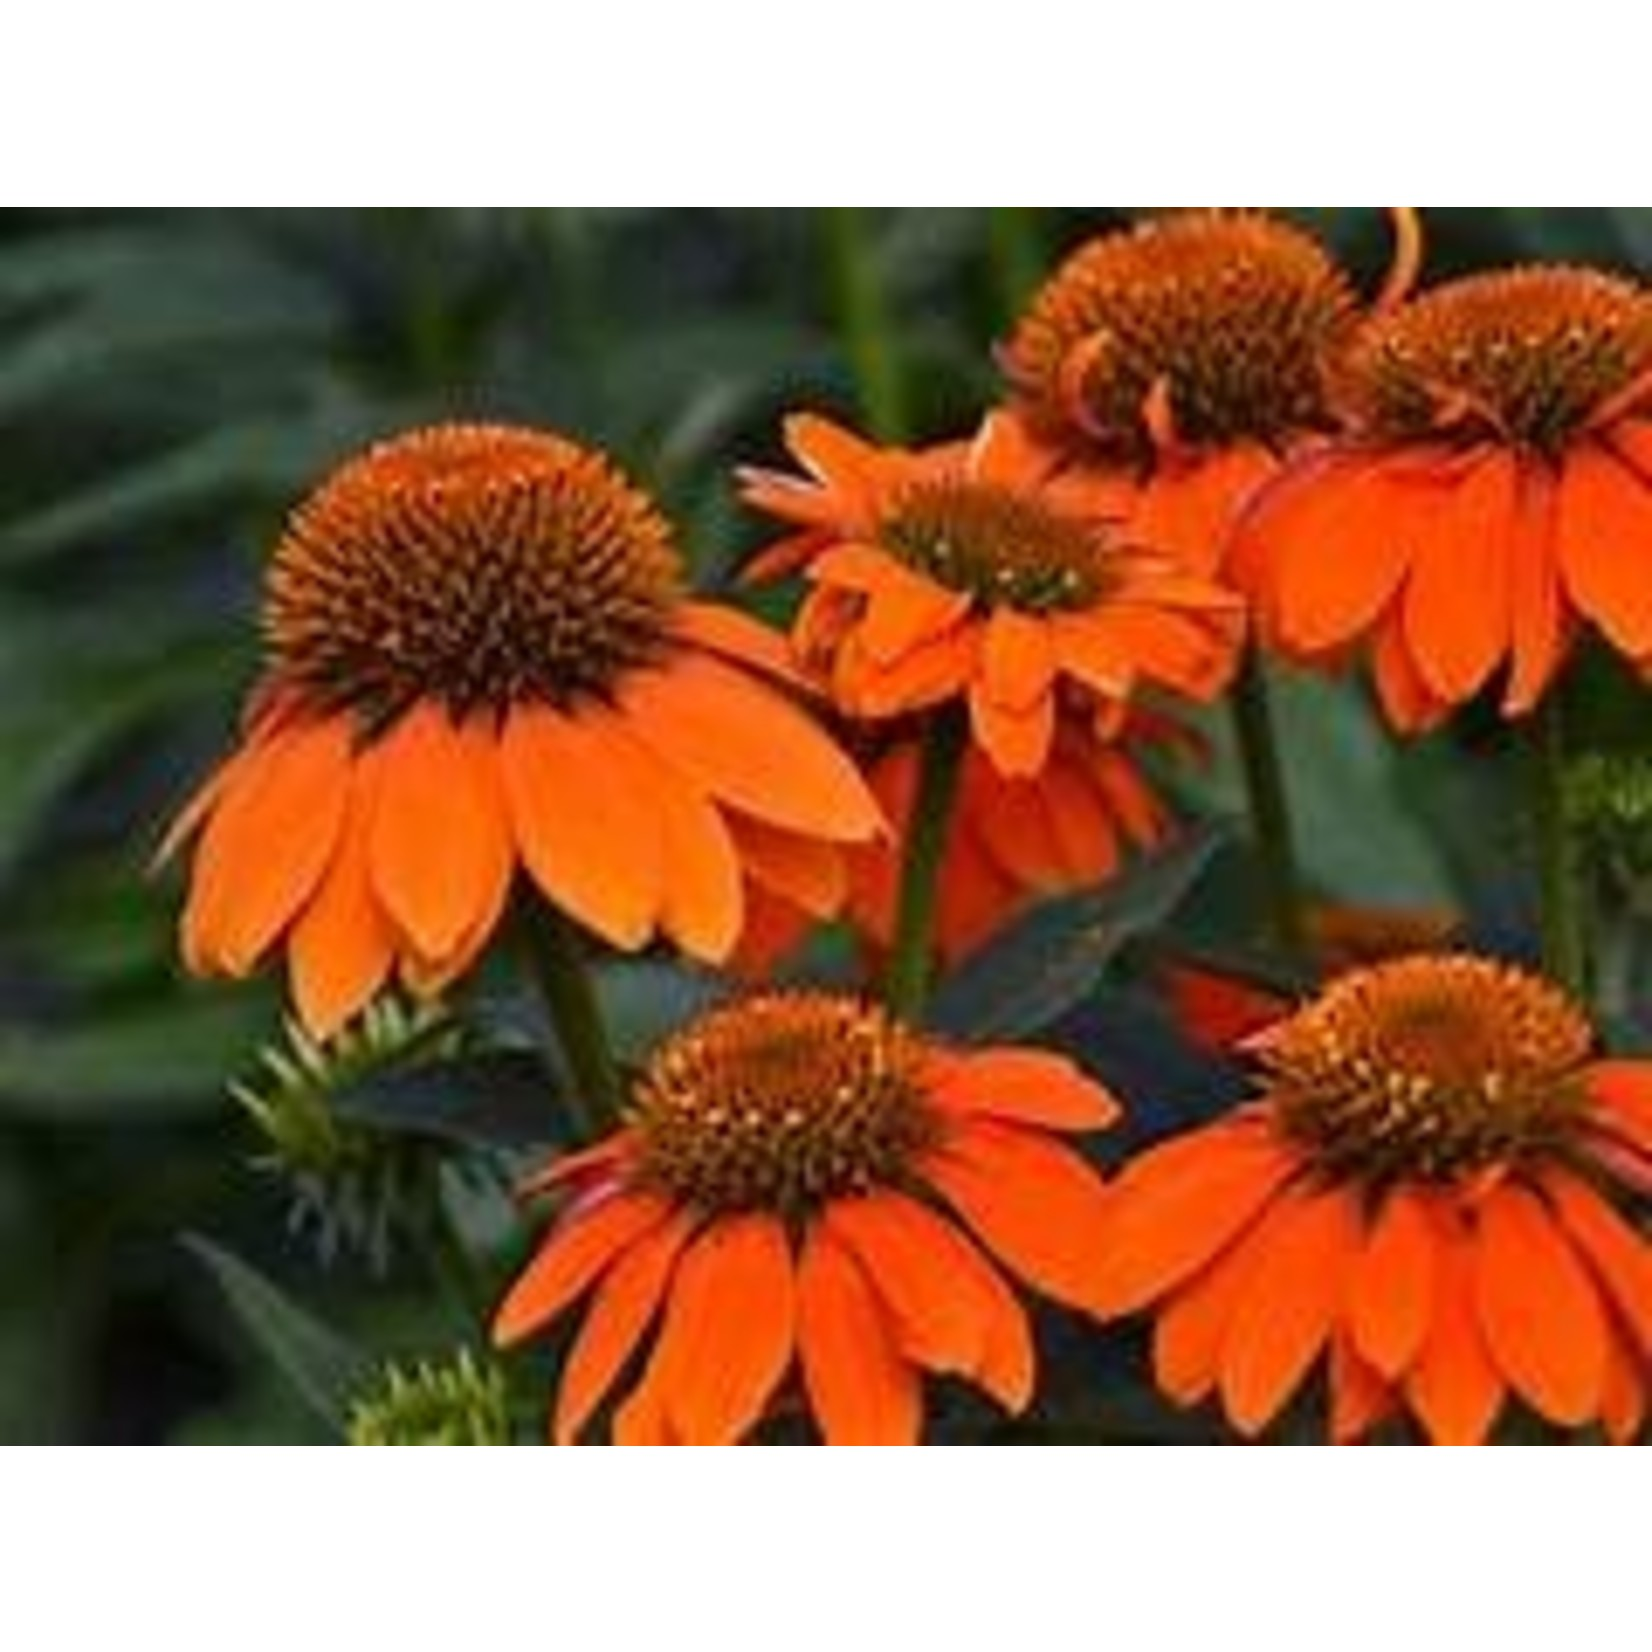 Cone Flower - Echinacea Sombrero Adobe Orange - 1 gal